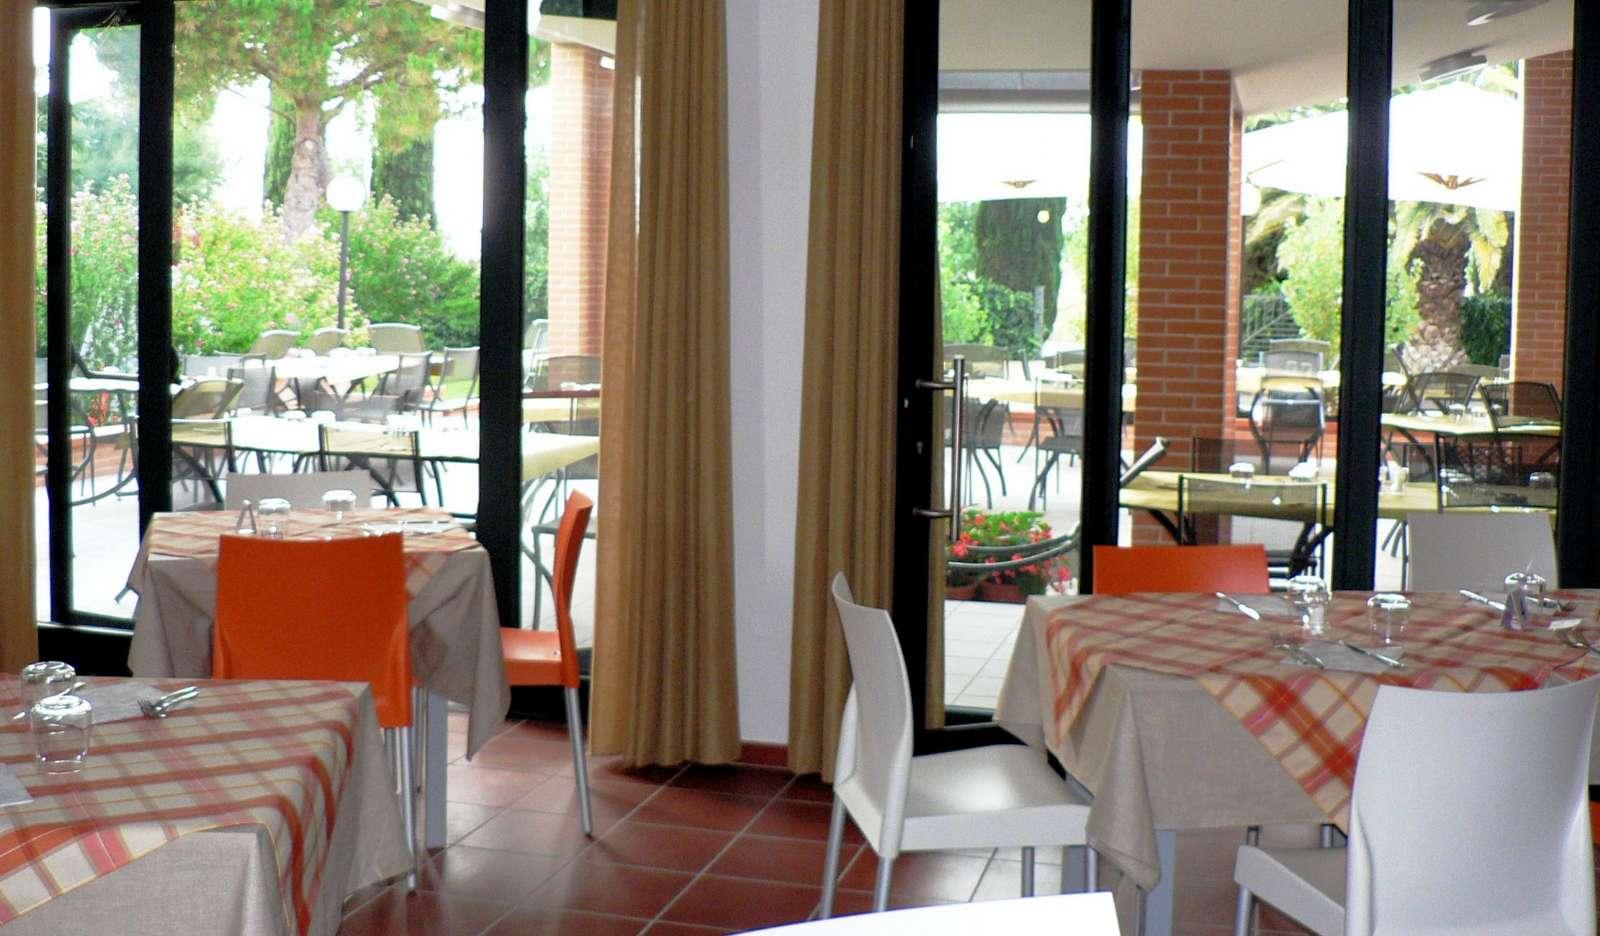 Restaurant de Ghiacci Vecchi